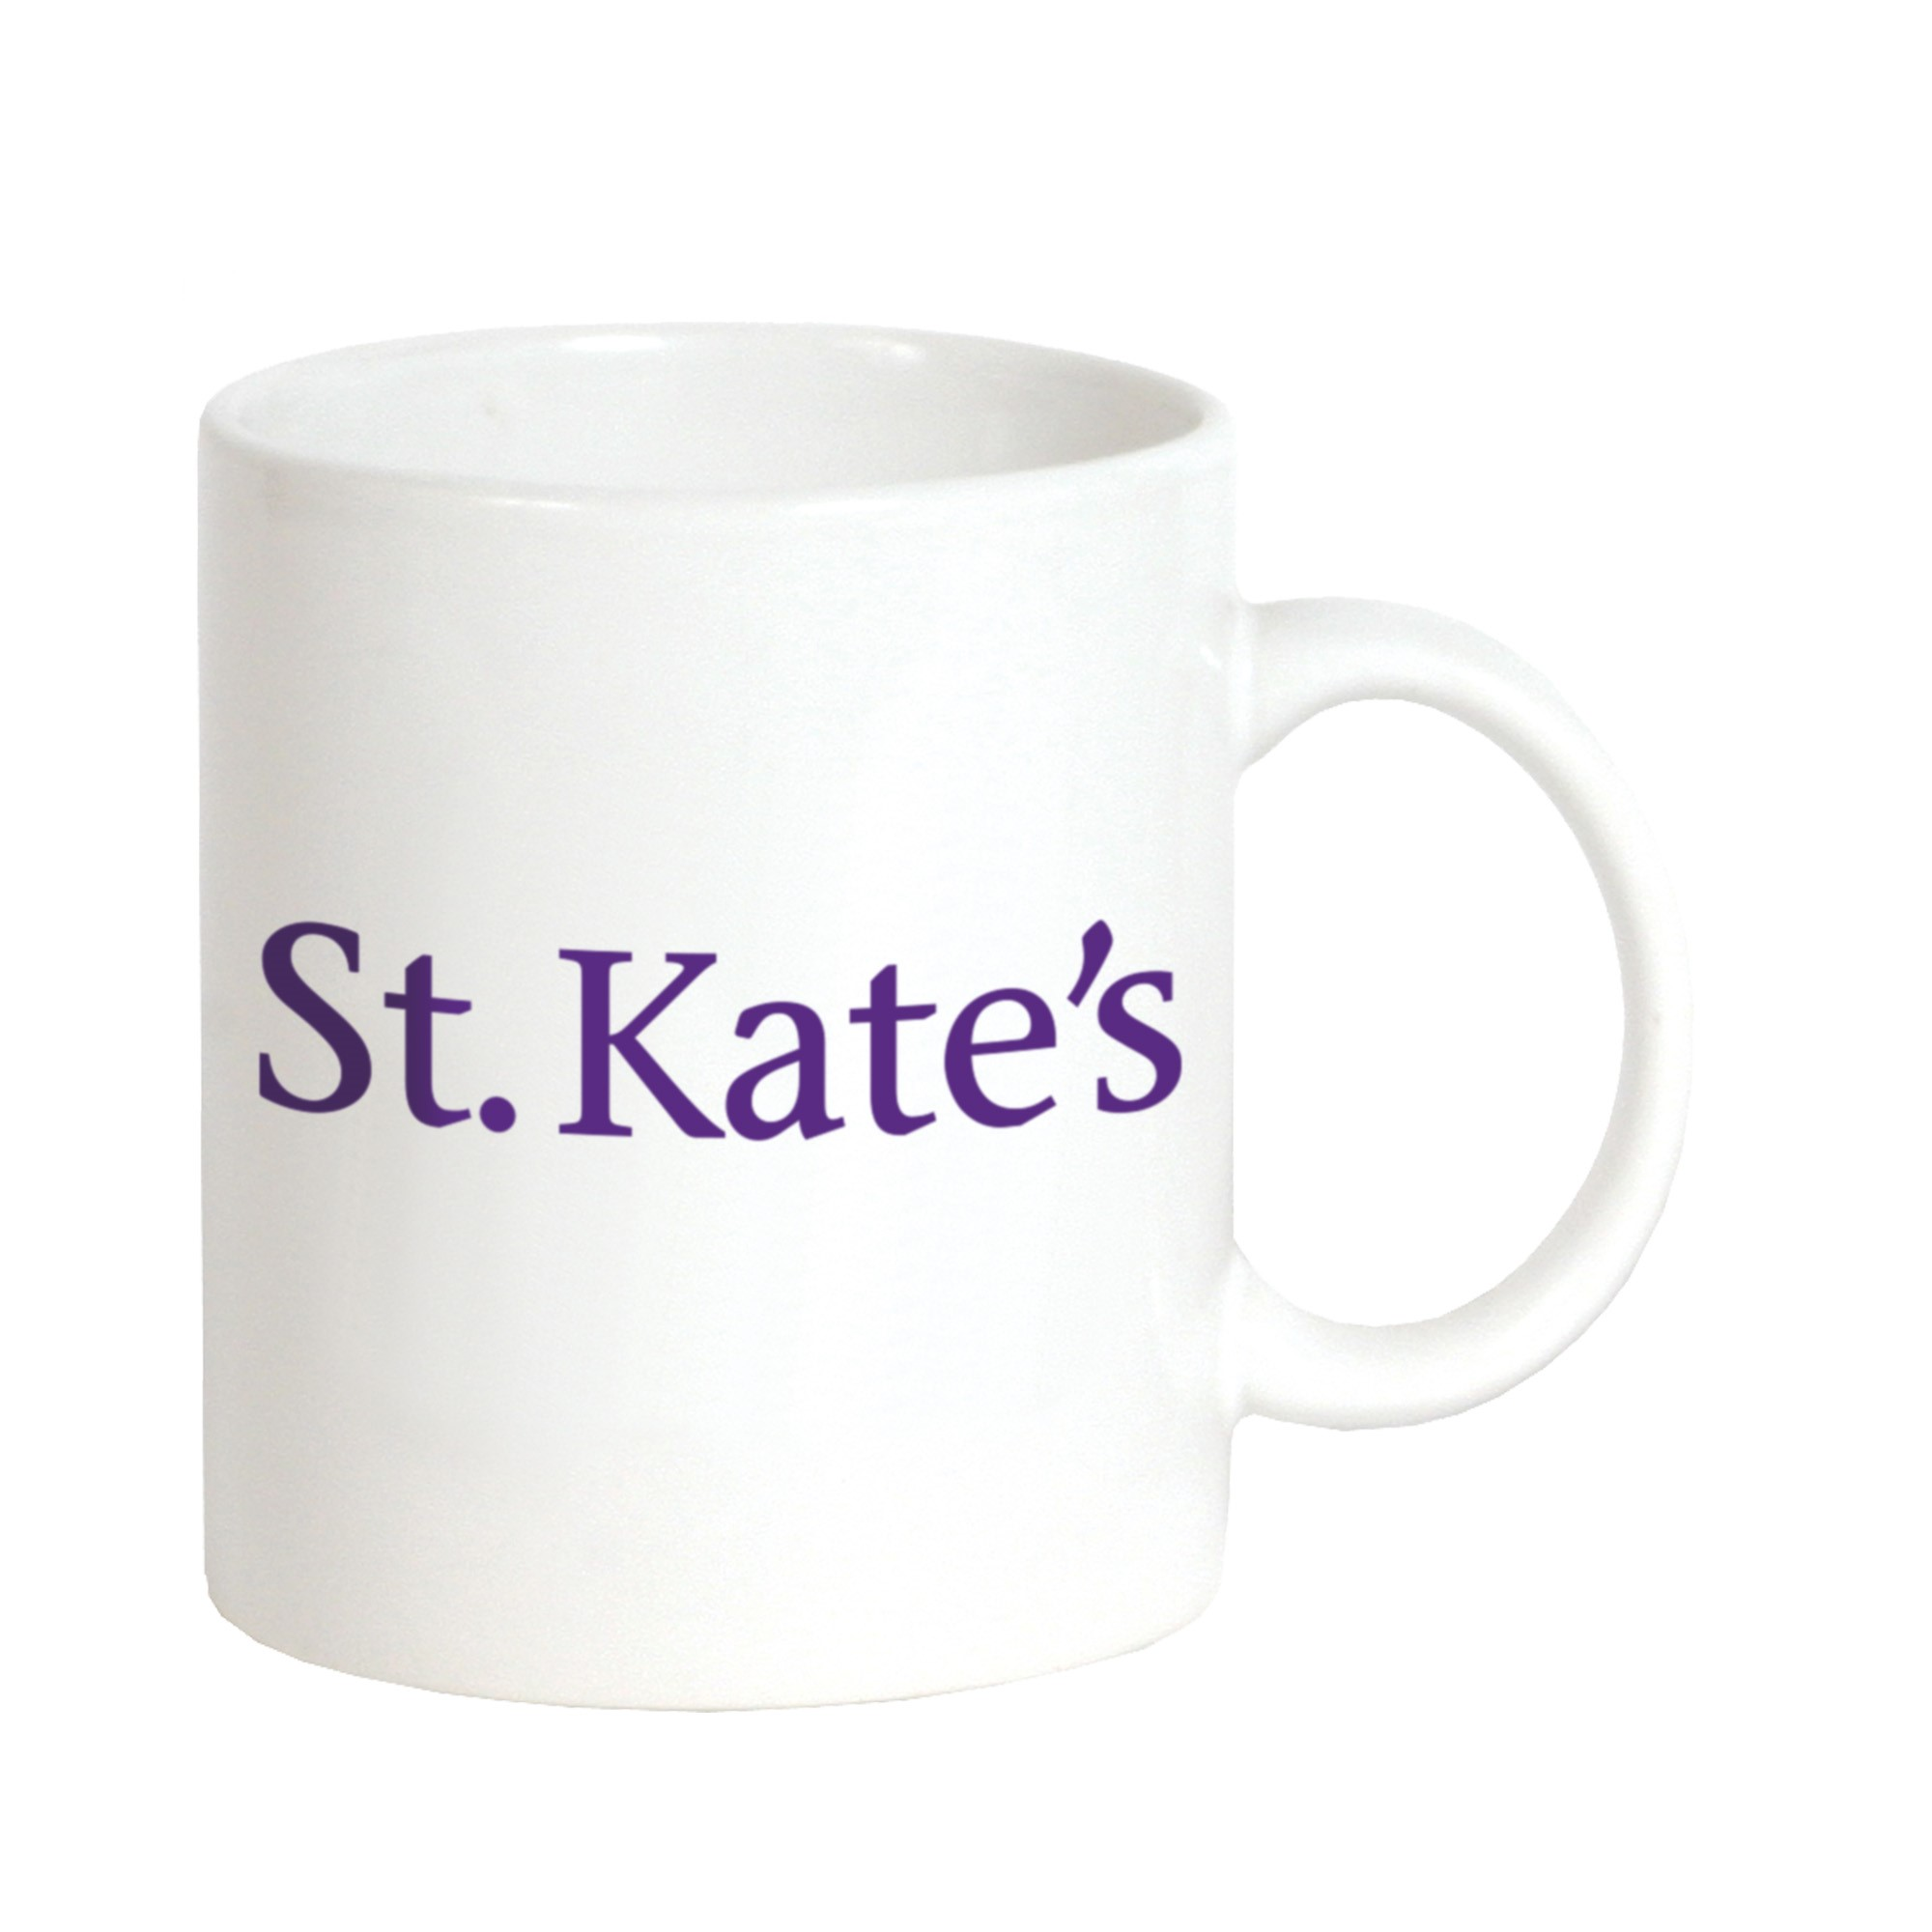 St. Kate's Coffee Mug